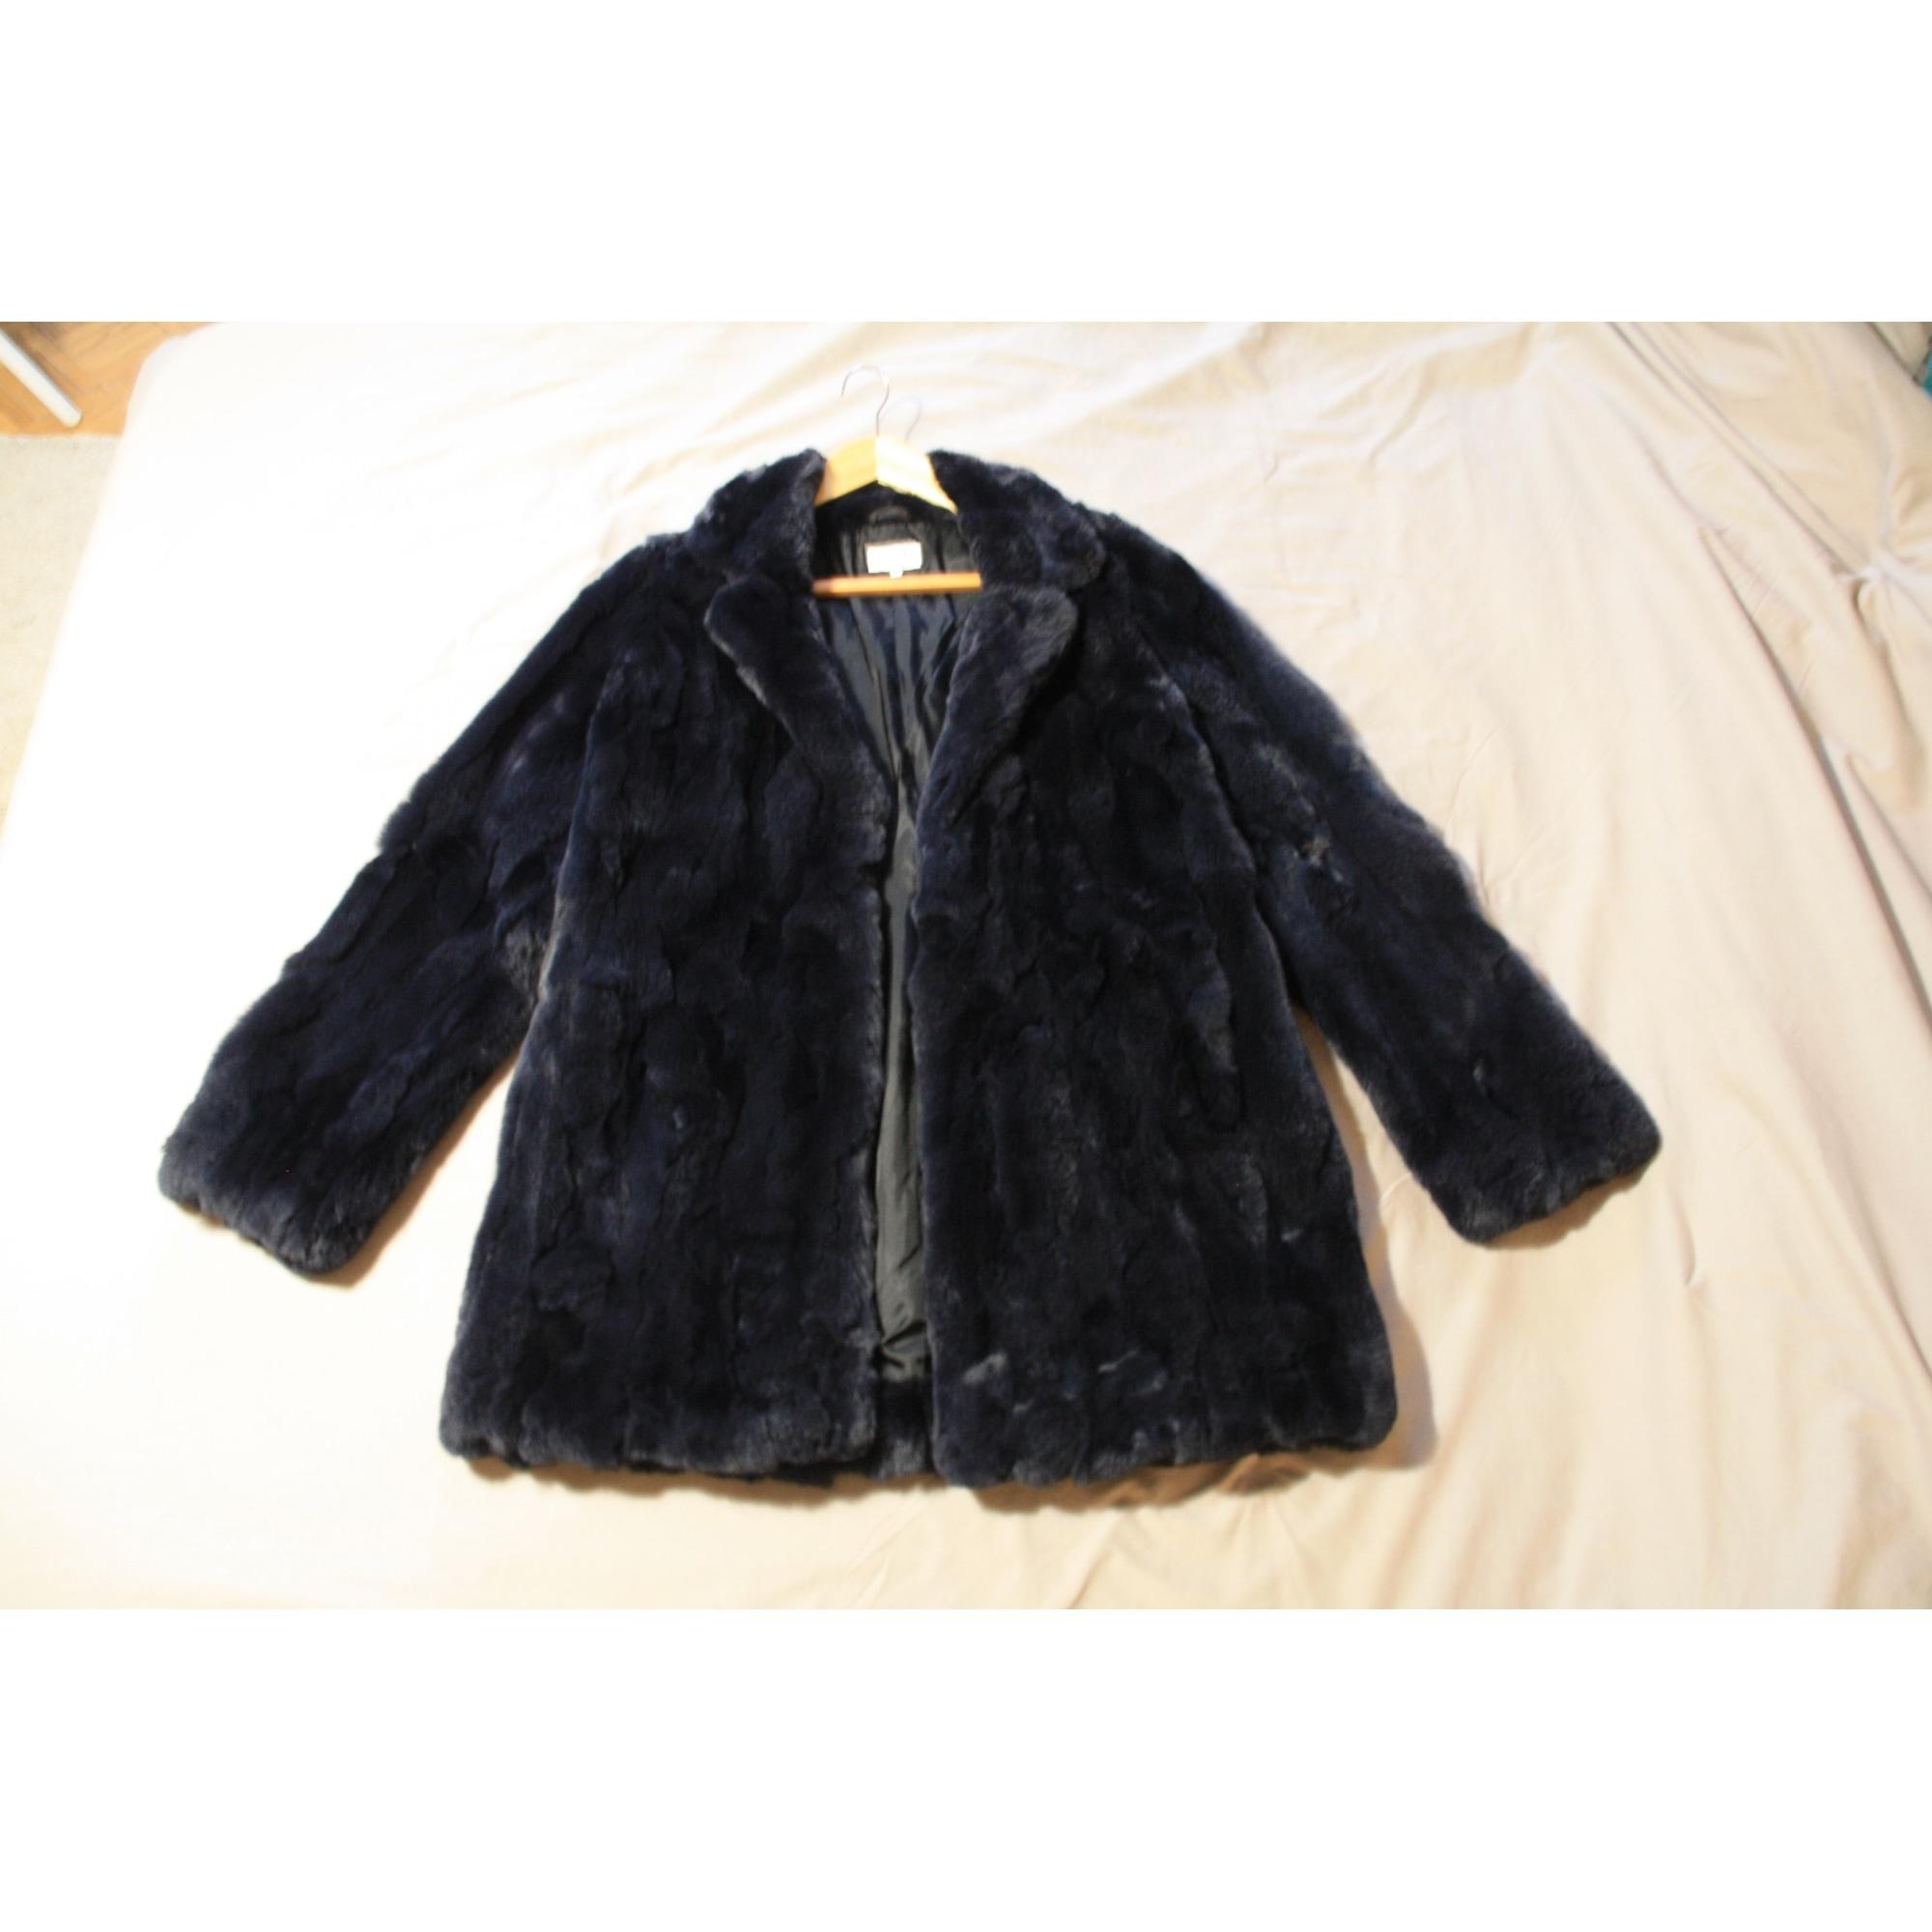 Manteau en fourrure HARTFORD 38 (M, T2) bleu 8392255